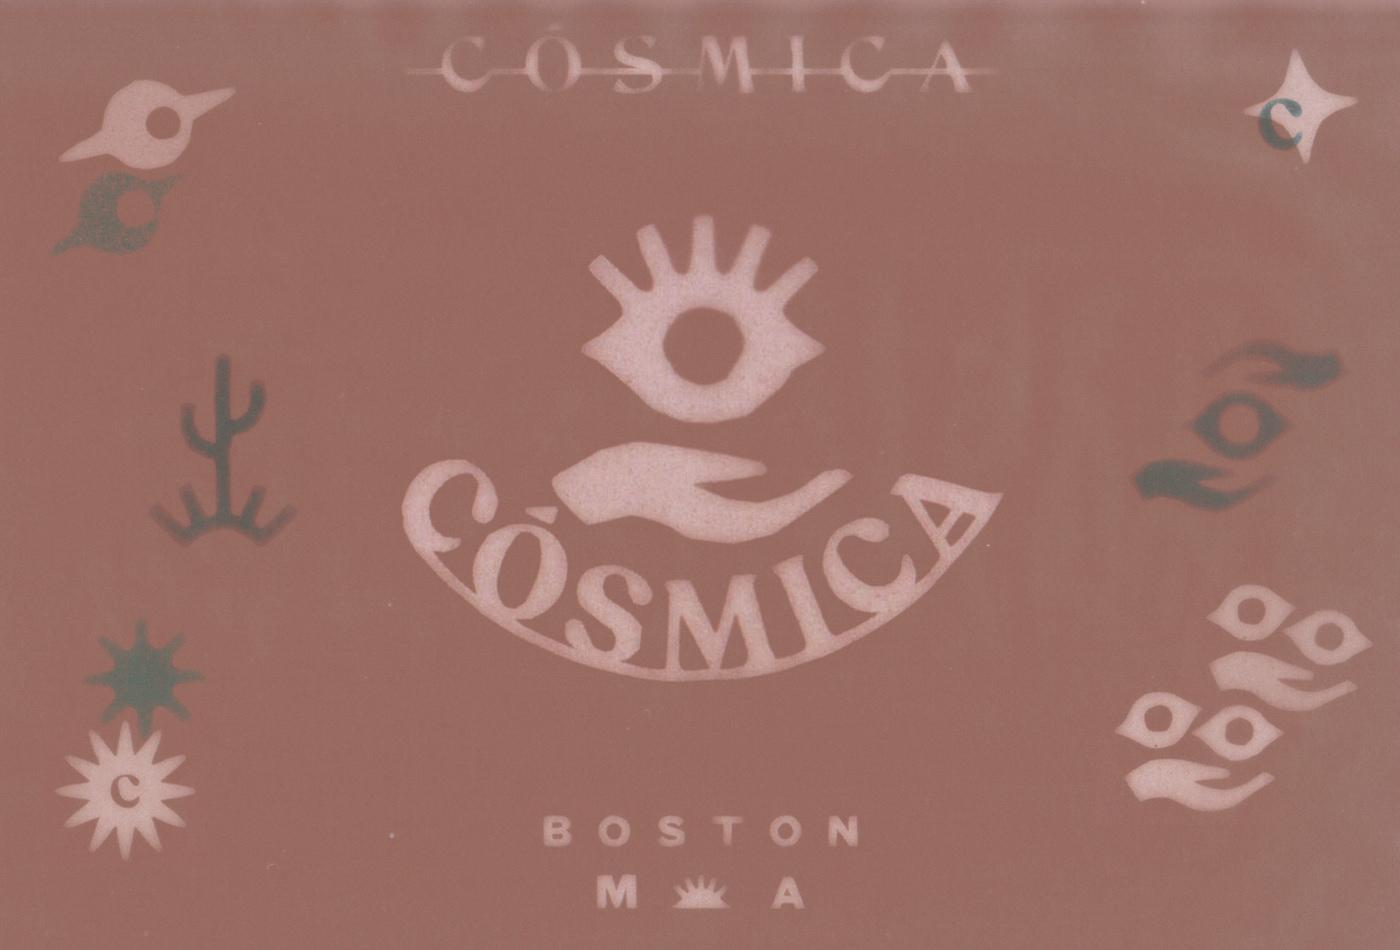 cosmica-cosmicaboston-boston-thebeehive-jackbardy-vacaliebres-branding-mexican-mexico-taco-tacos-cla-mex-logo-eye-cosmiceye-god-beams-sun-saturn